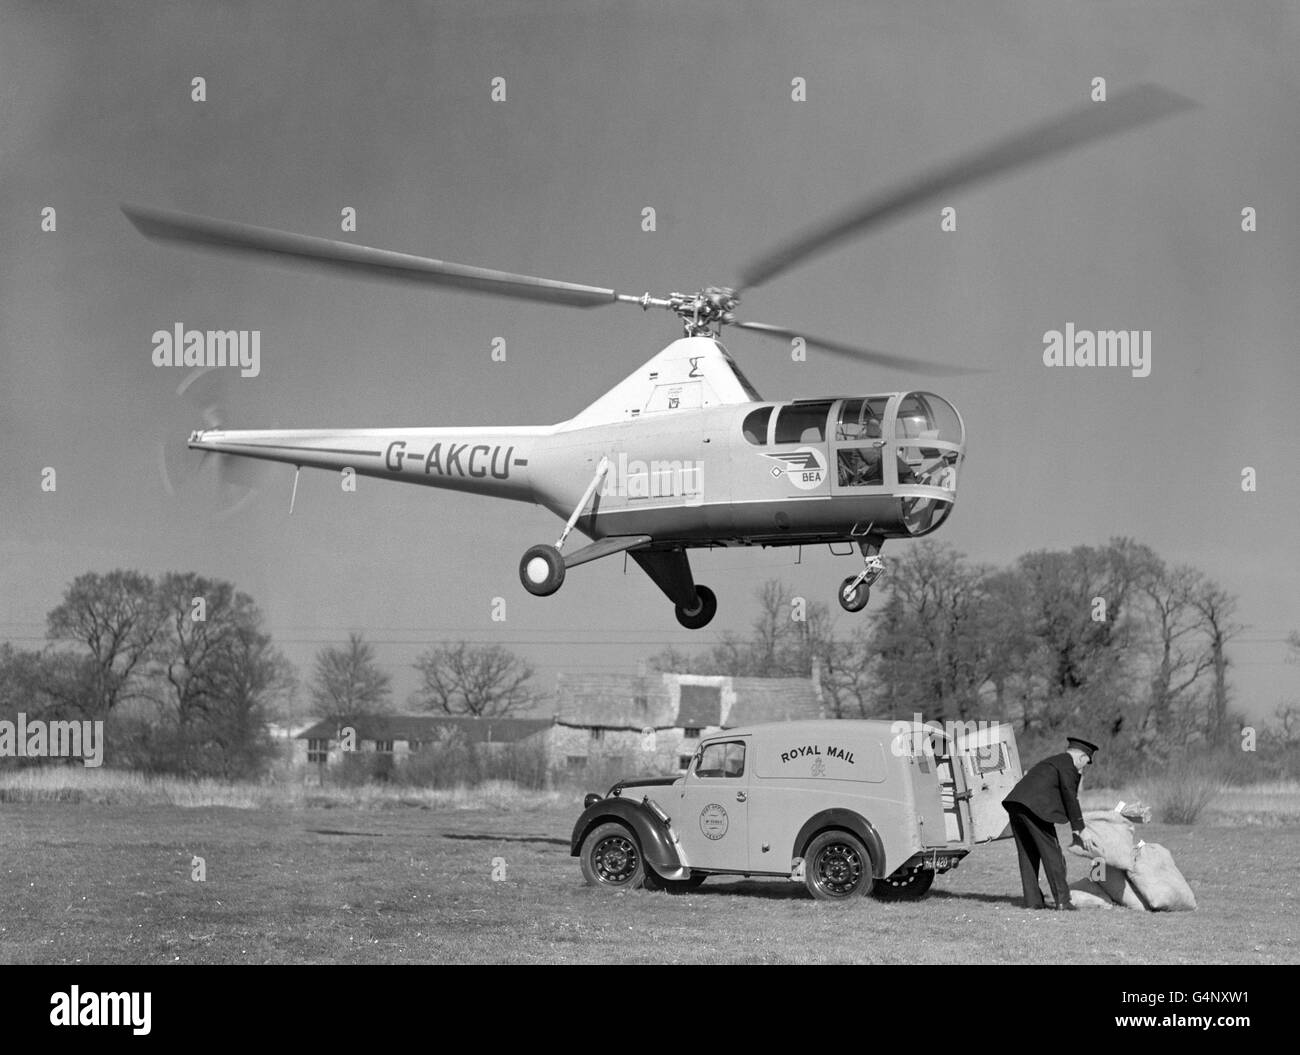 British Postal Service - Royal Mail - Air Mail Experiment - Yeovil - Stock Image